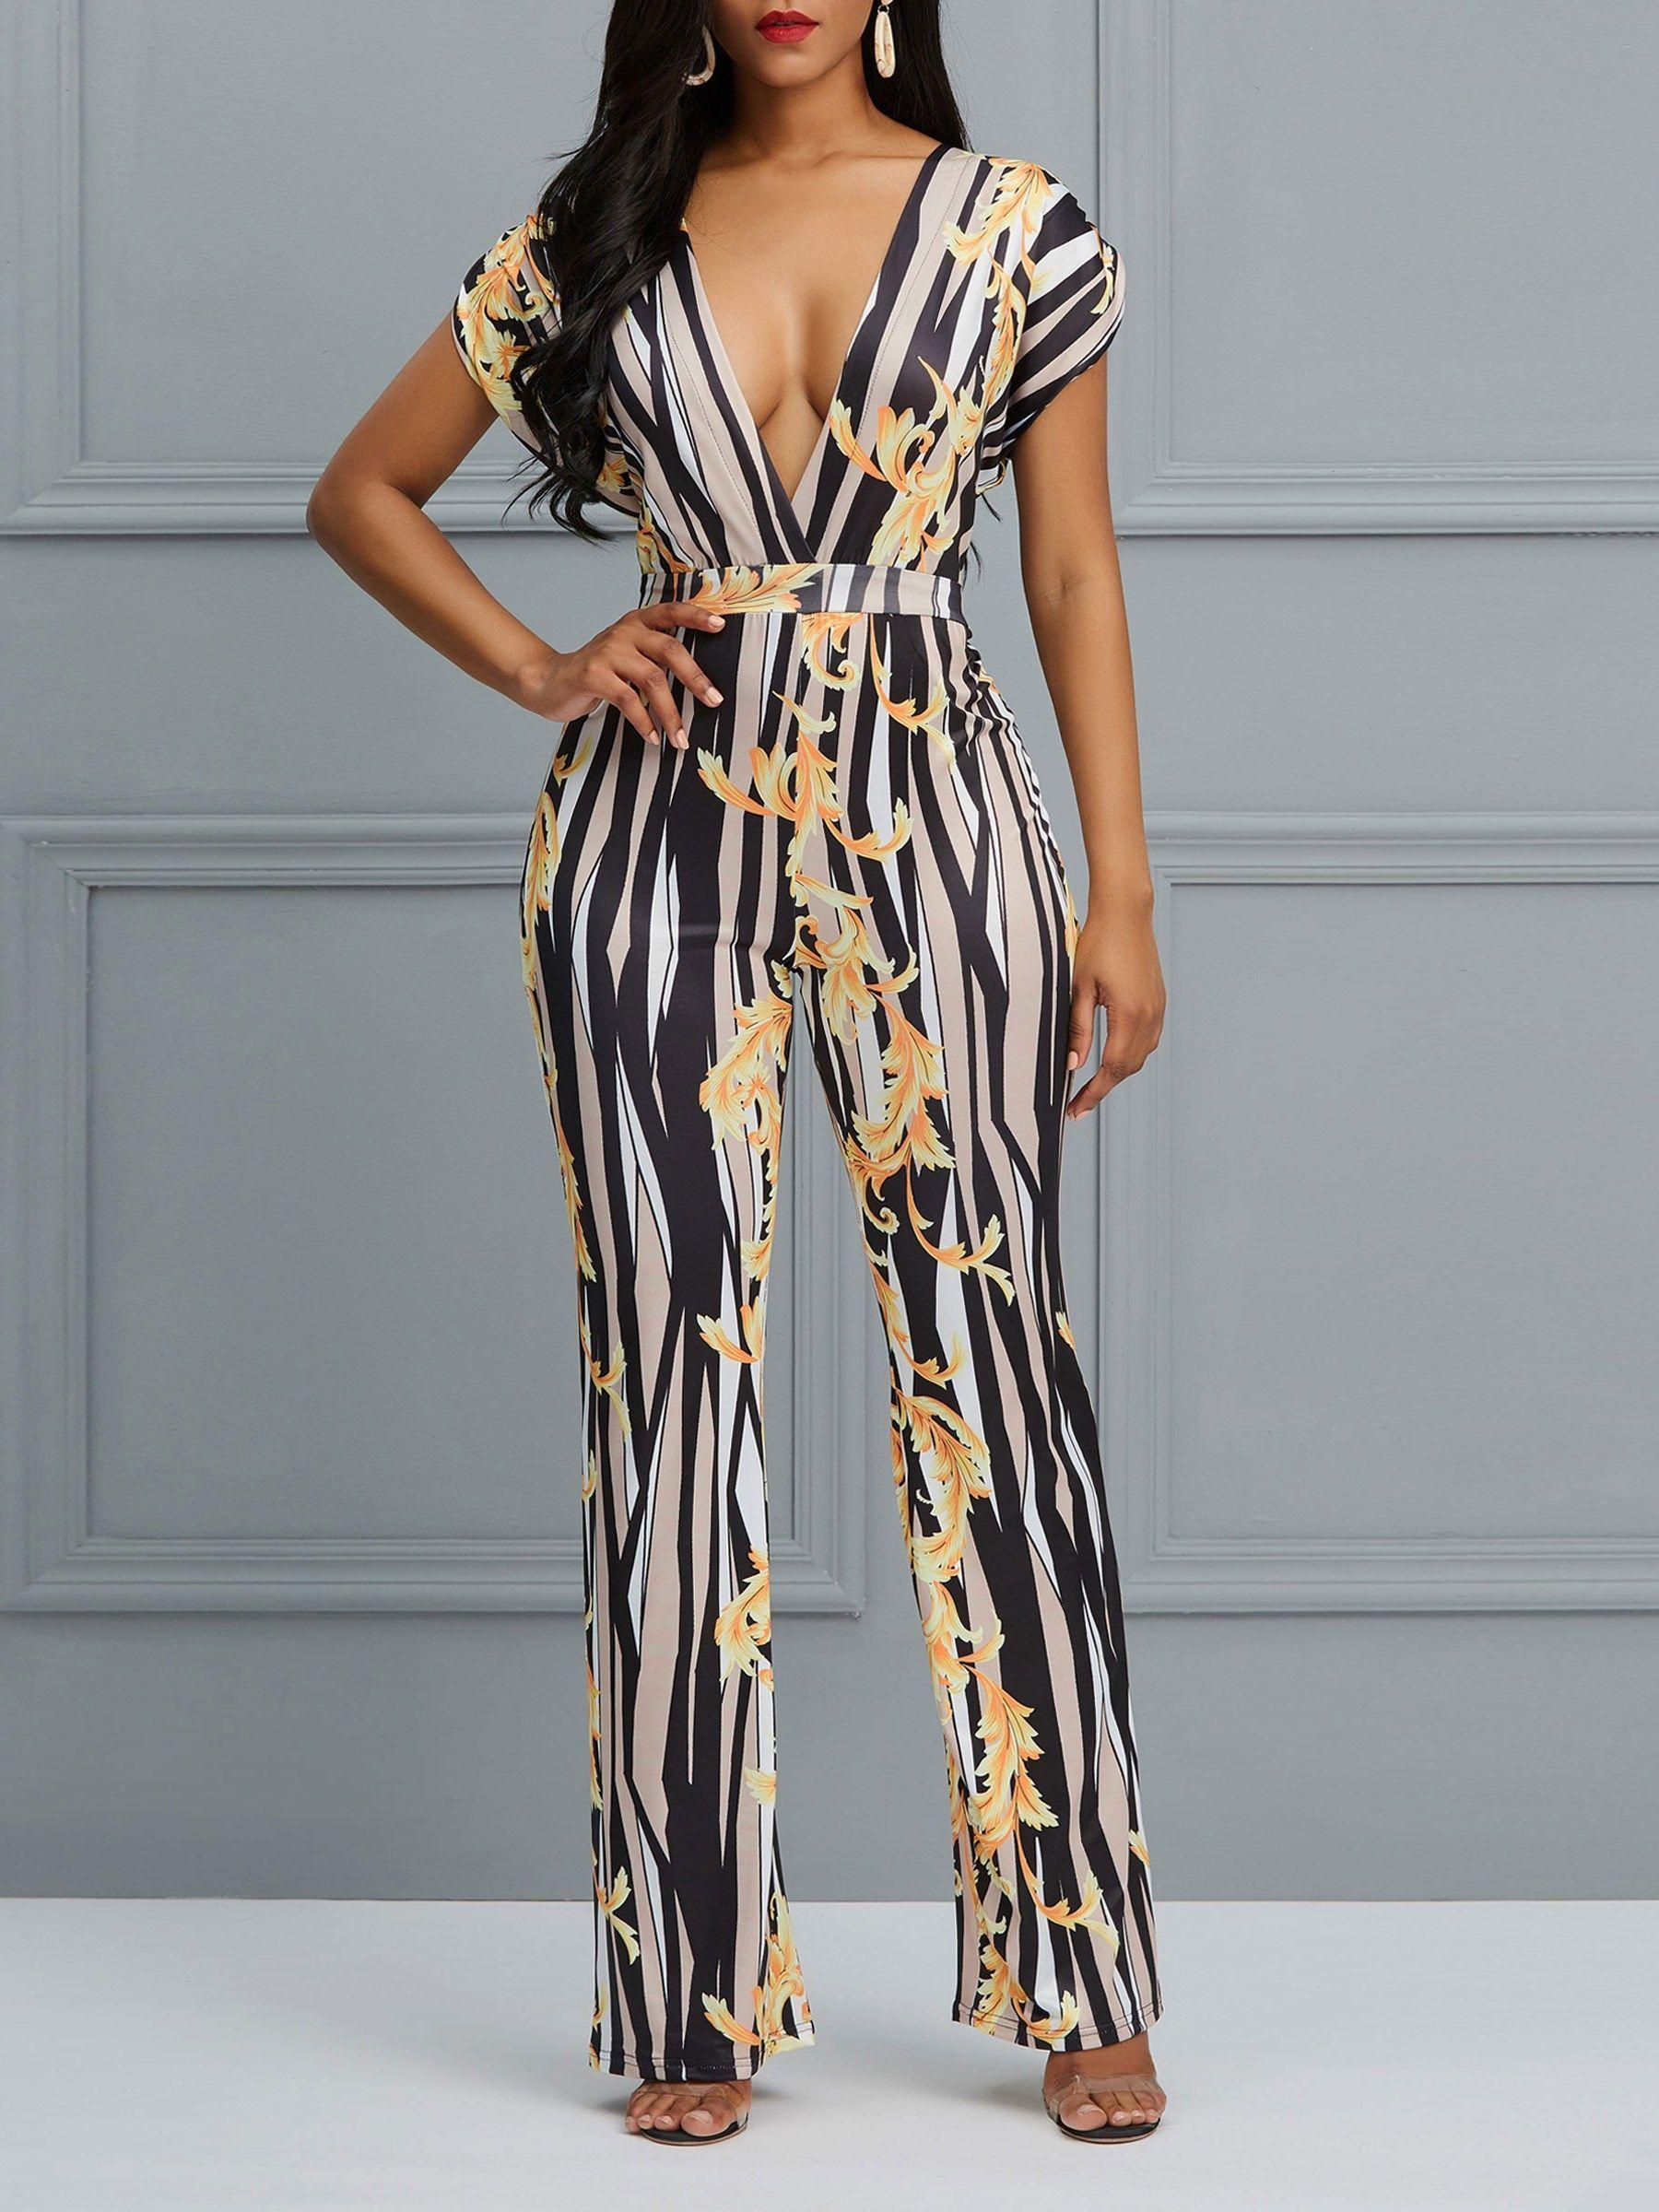 a9685f9860d Deep V Floral Striped Skinny Women s Jumpsuit